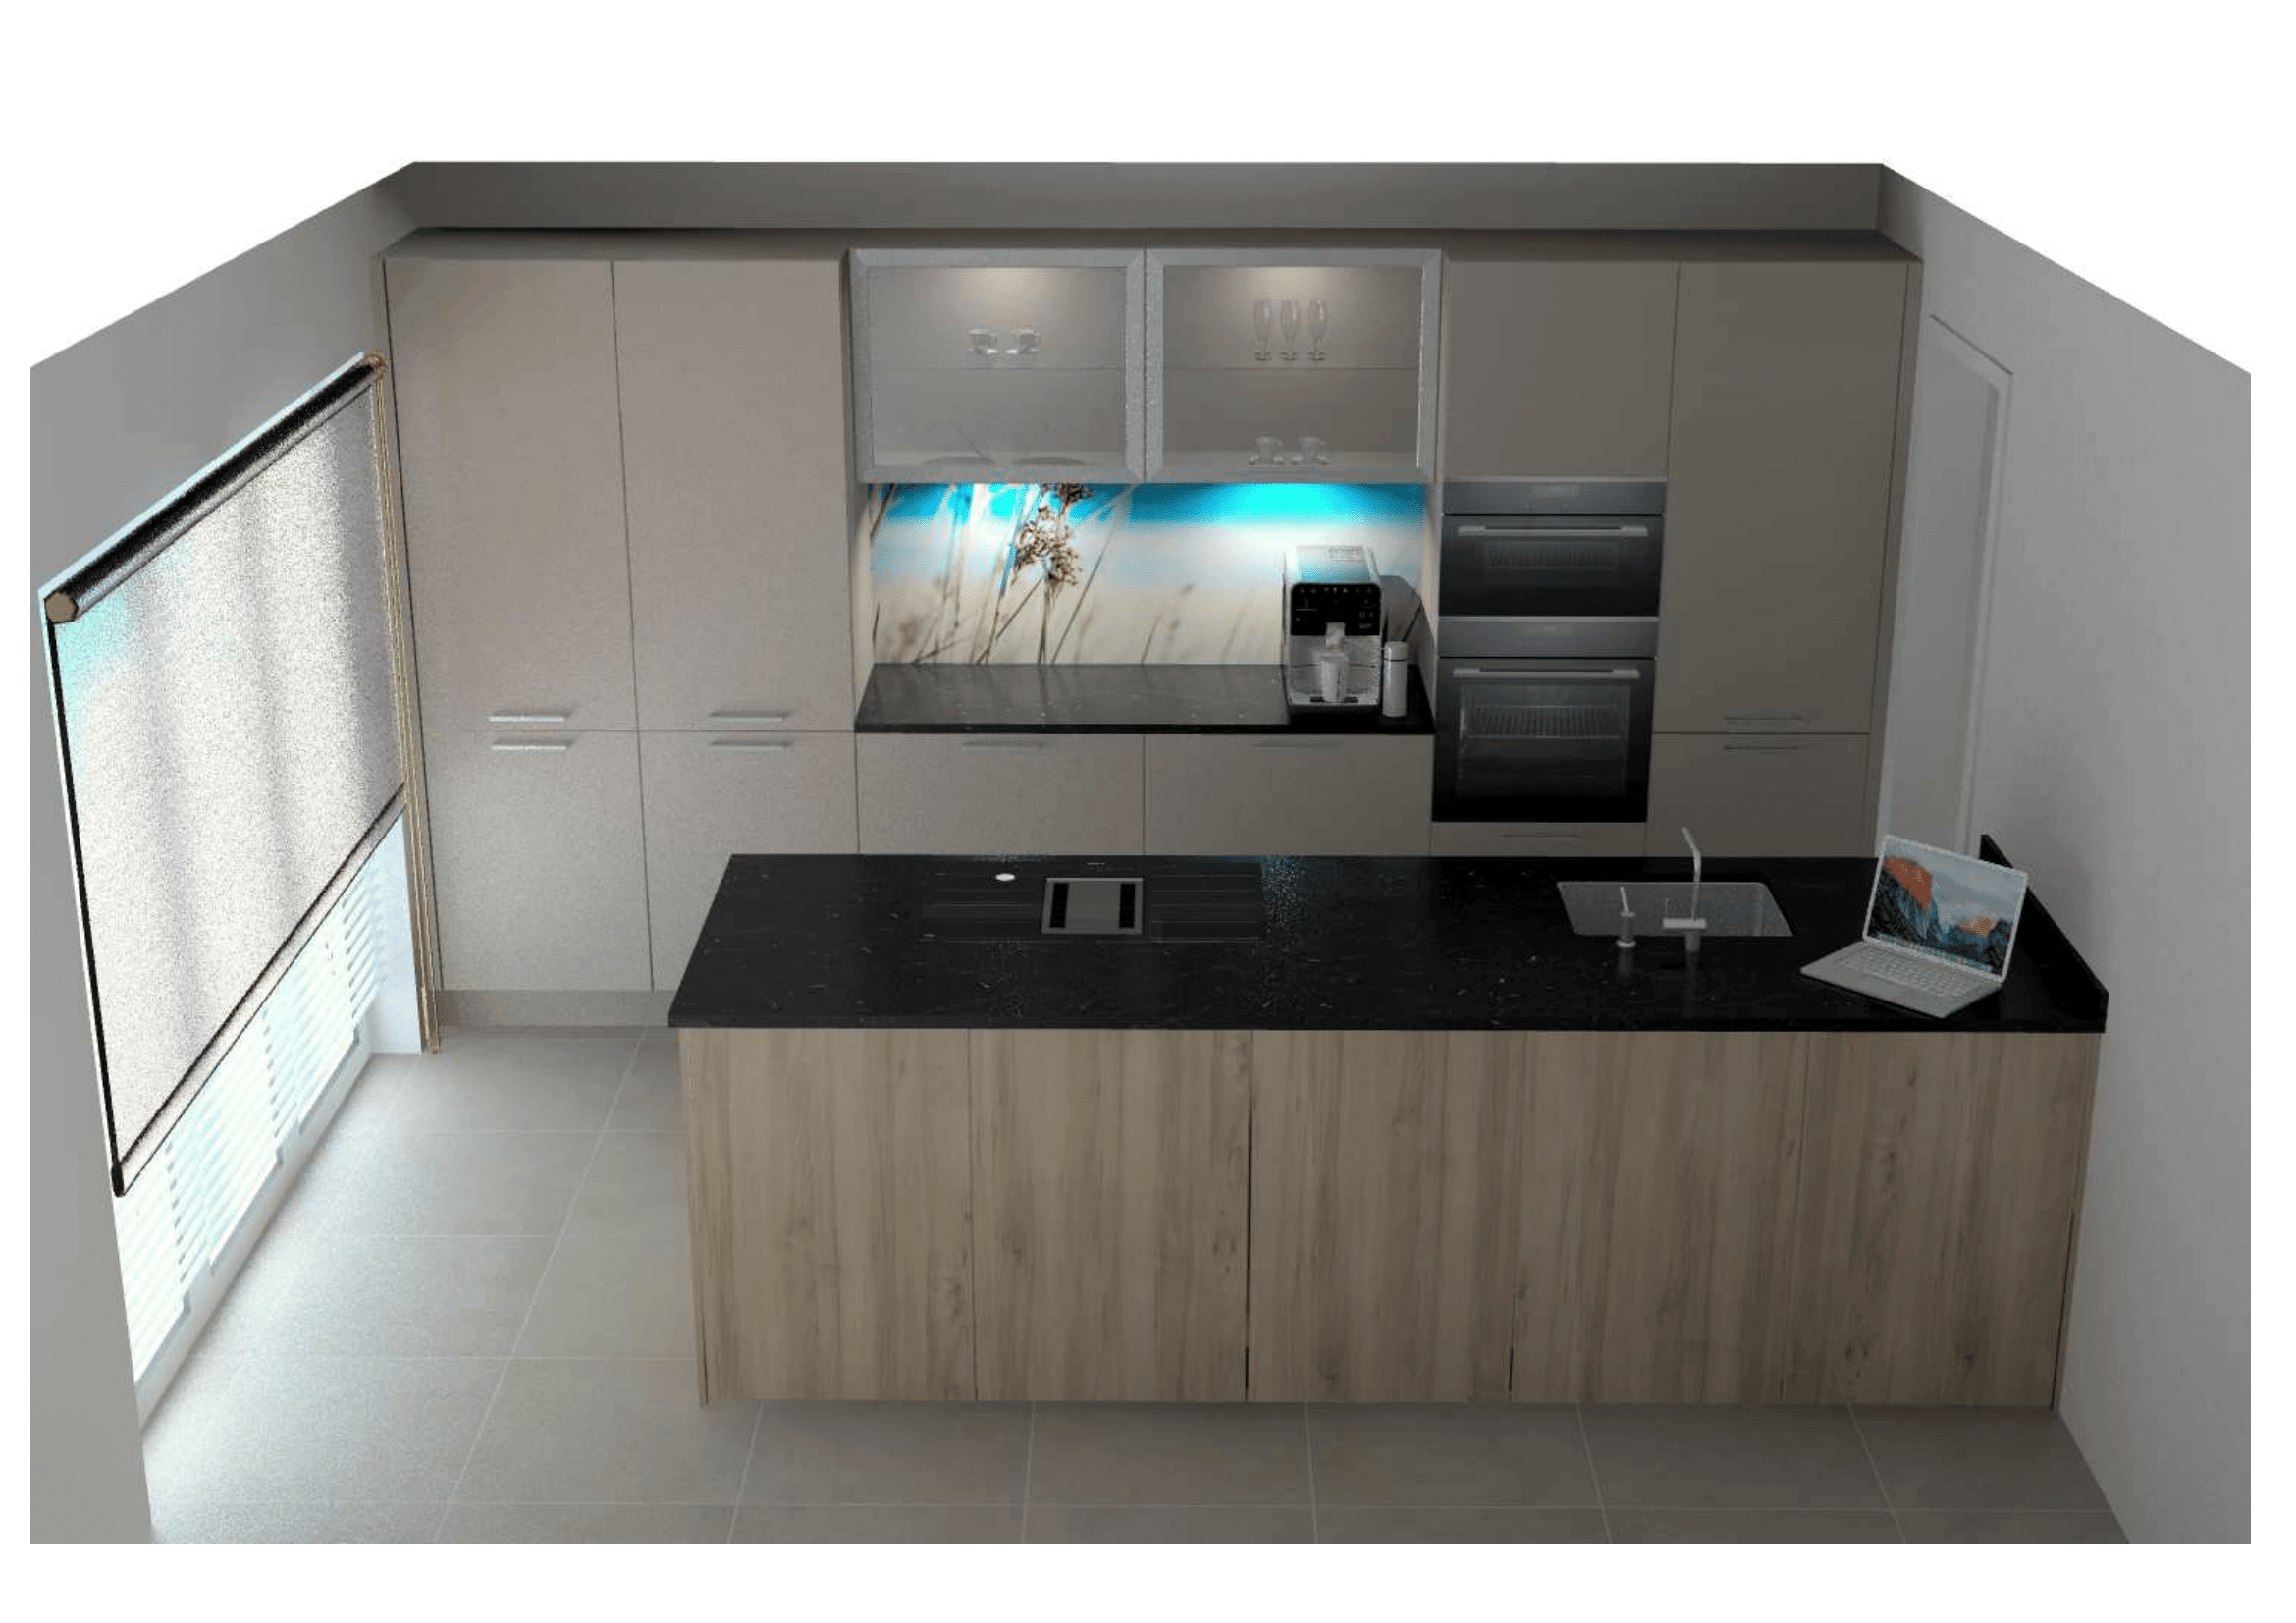 Full Size of Küche Ohne Elektrogeräte Günstig Küche Ohne Elektrogeräte Gebraucht Komplette Küche Ohne Elektrogeräte Küche Ohne Elektrogeräte Kaufen Sinnvoll Küche Küche Ohne Elektrogeräte